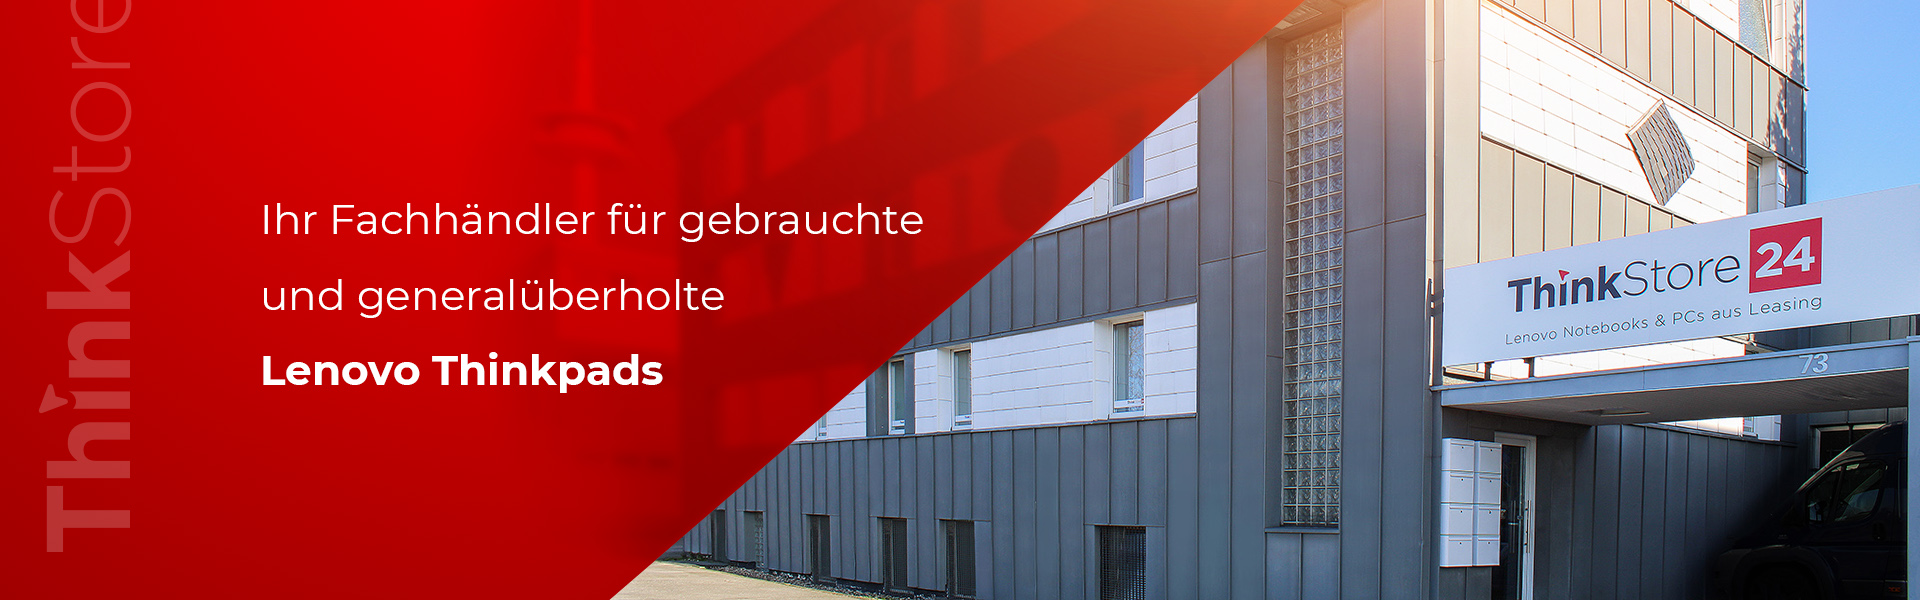 Firmengebäude Thinkstore24.de